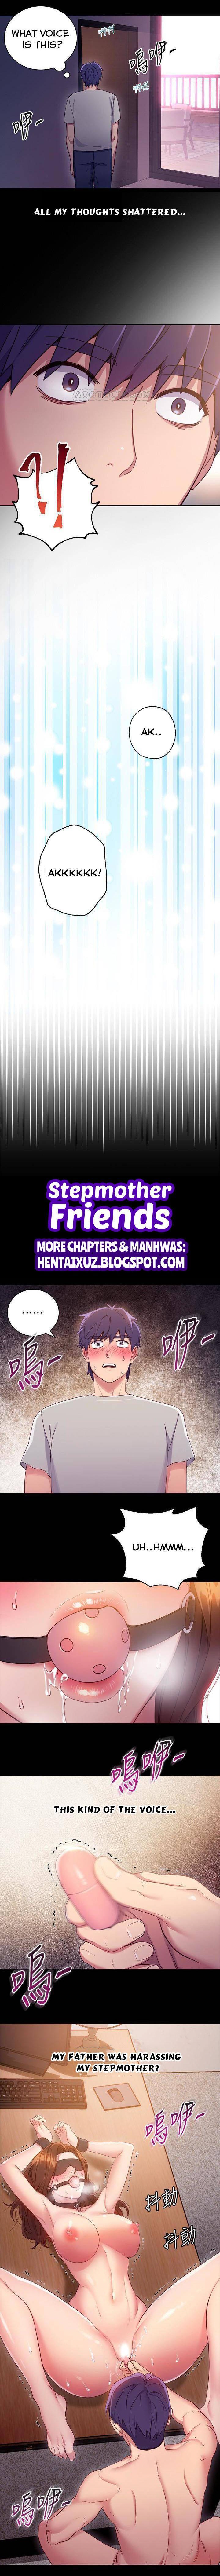 Stepmother Friends Ch.29/? 101